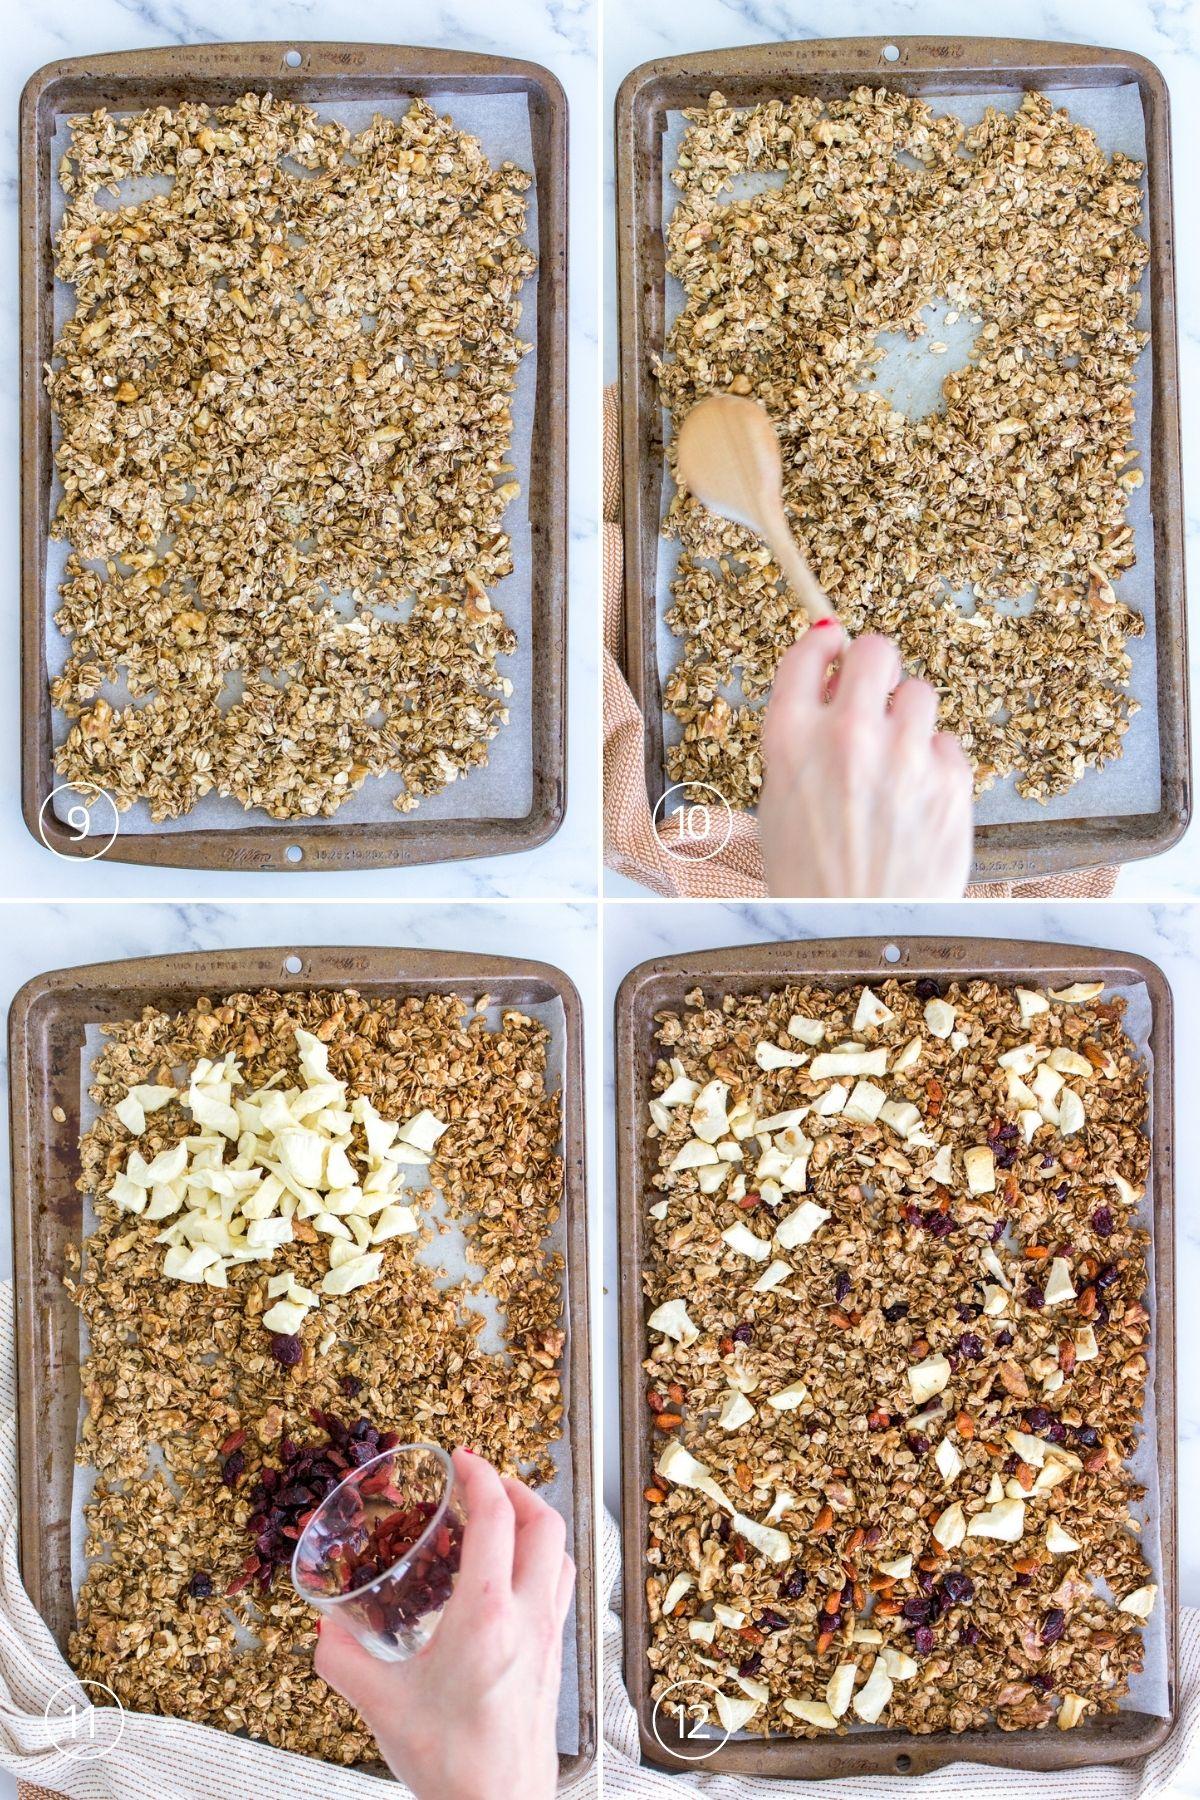 Apple Cinnamon Granola process shots